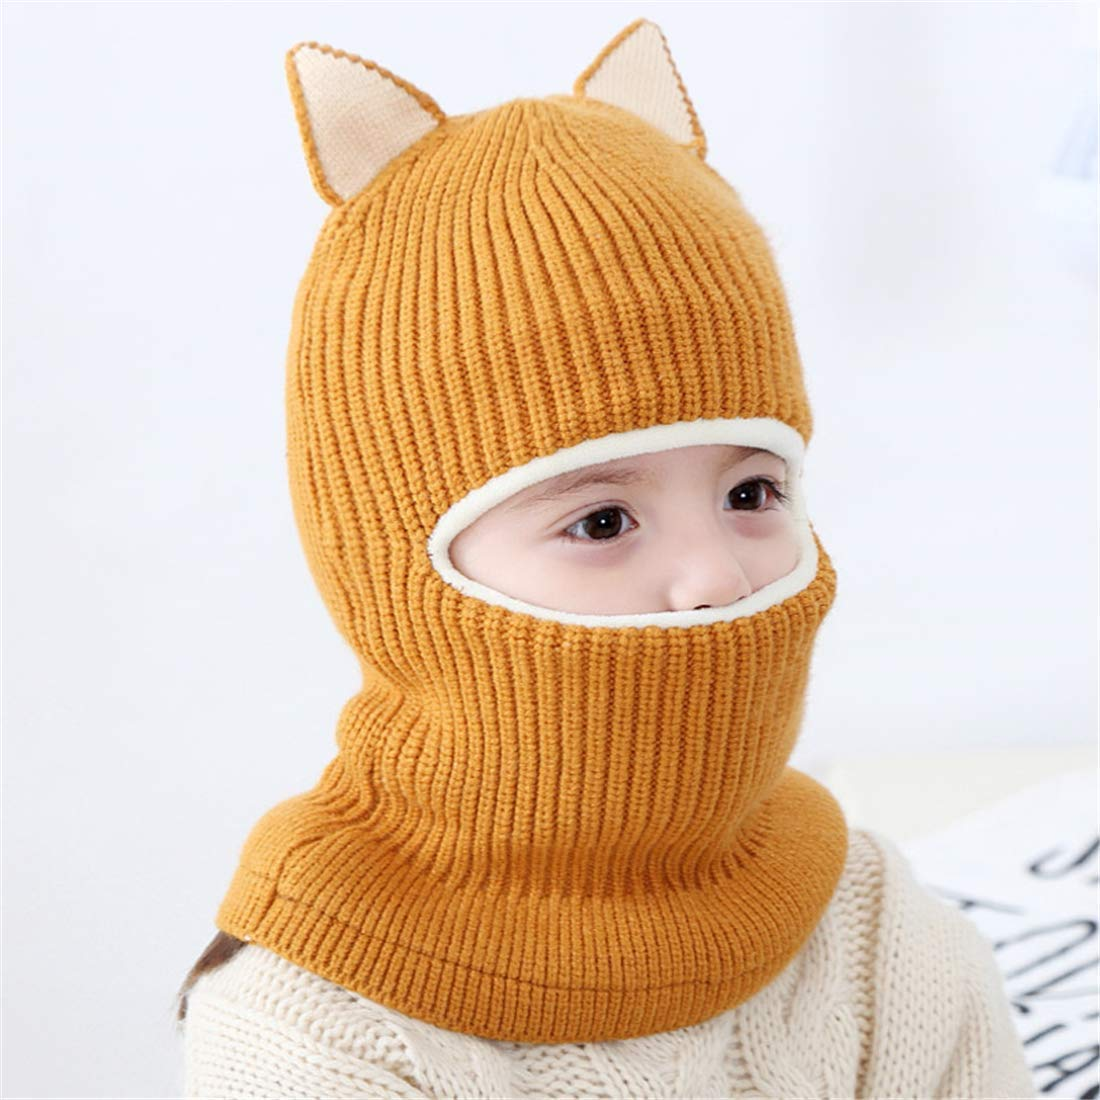 Rgslon Baby Girls Warm Hat Scarf Kid Fleece Lined Earflap Caps Windproof Balacalva